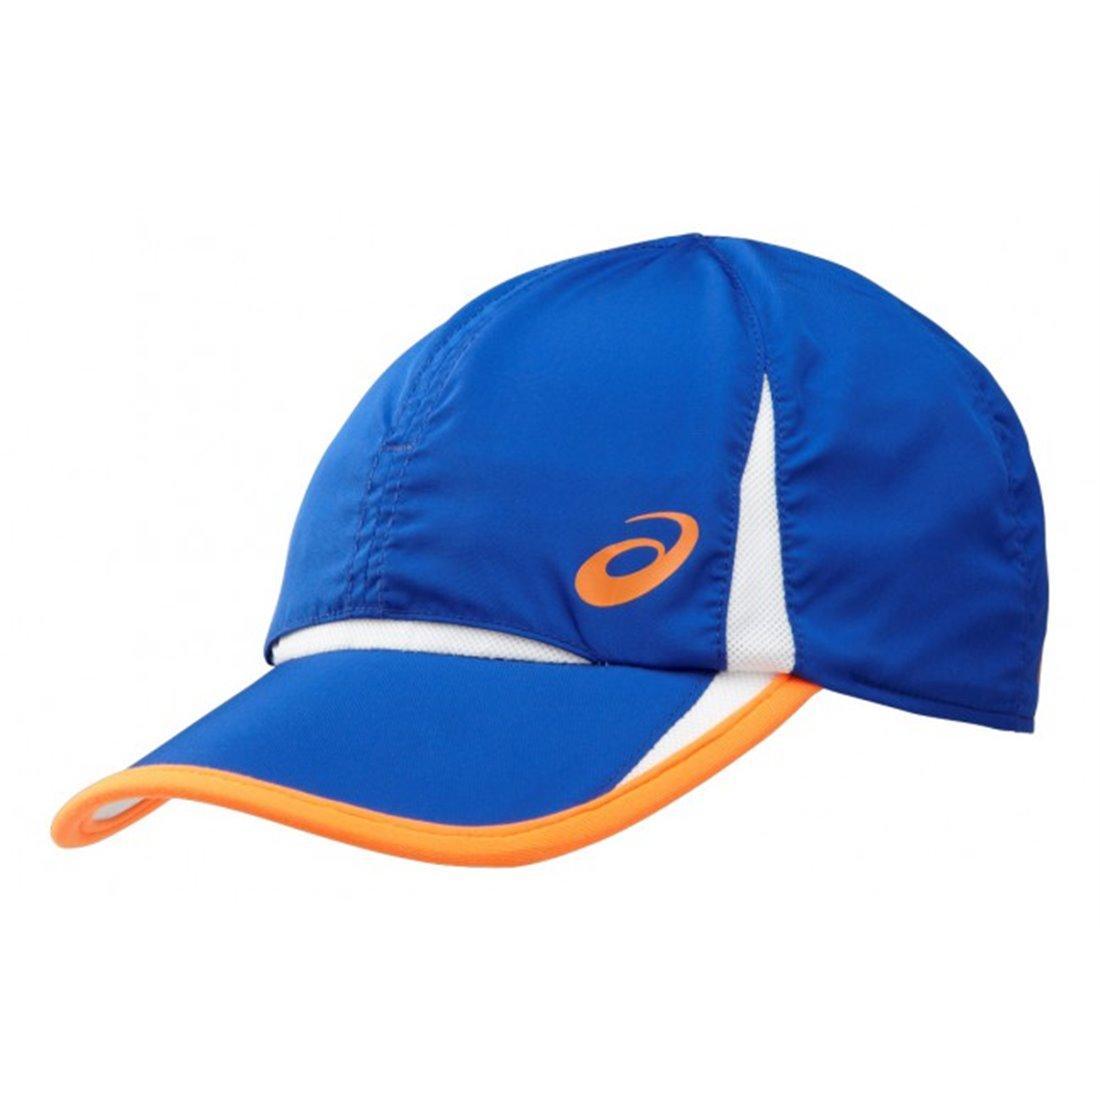 Кепка Asics Tennis cap blue/orange (123003-8107)